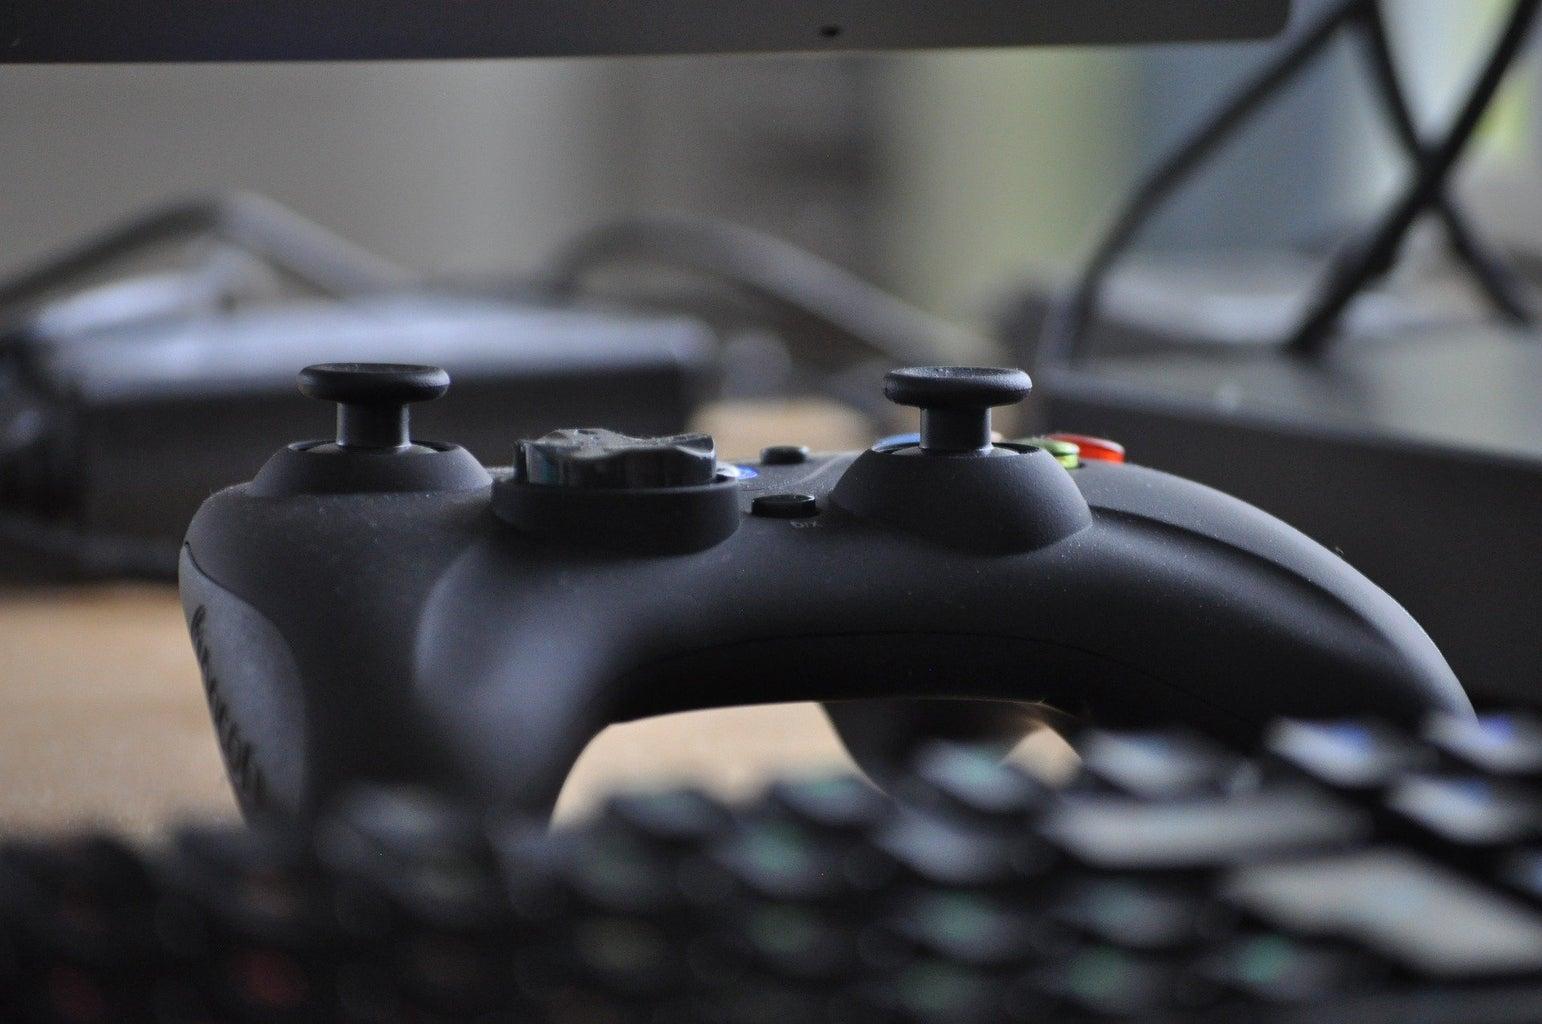 game controller sitting near a keyboard